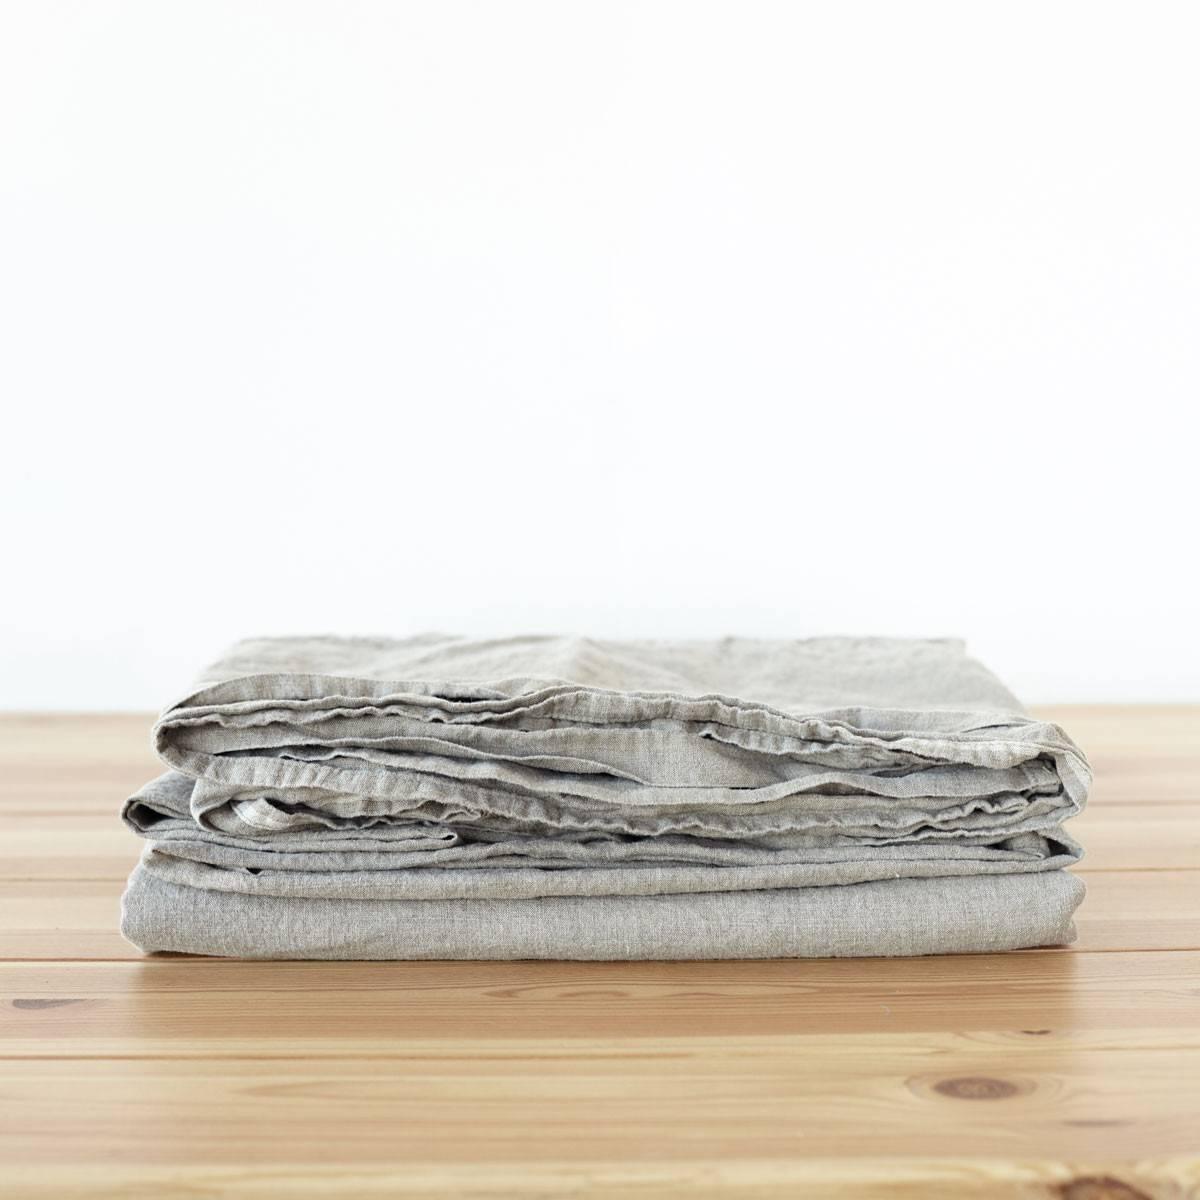 How to make linen sheets last longer?